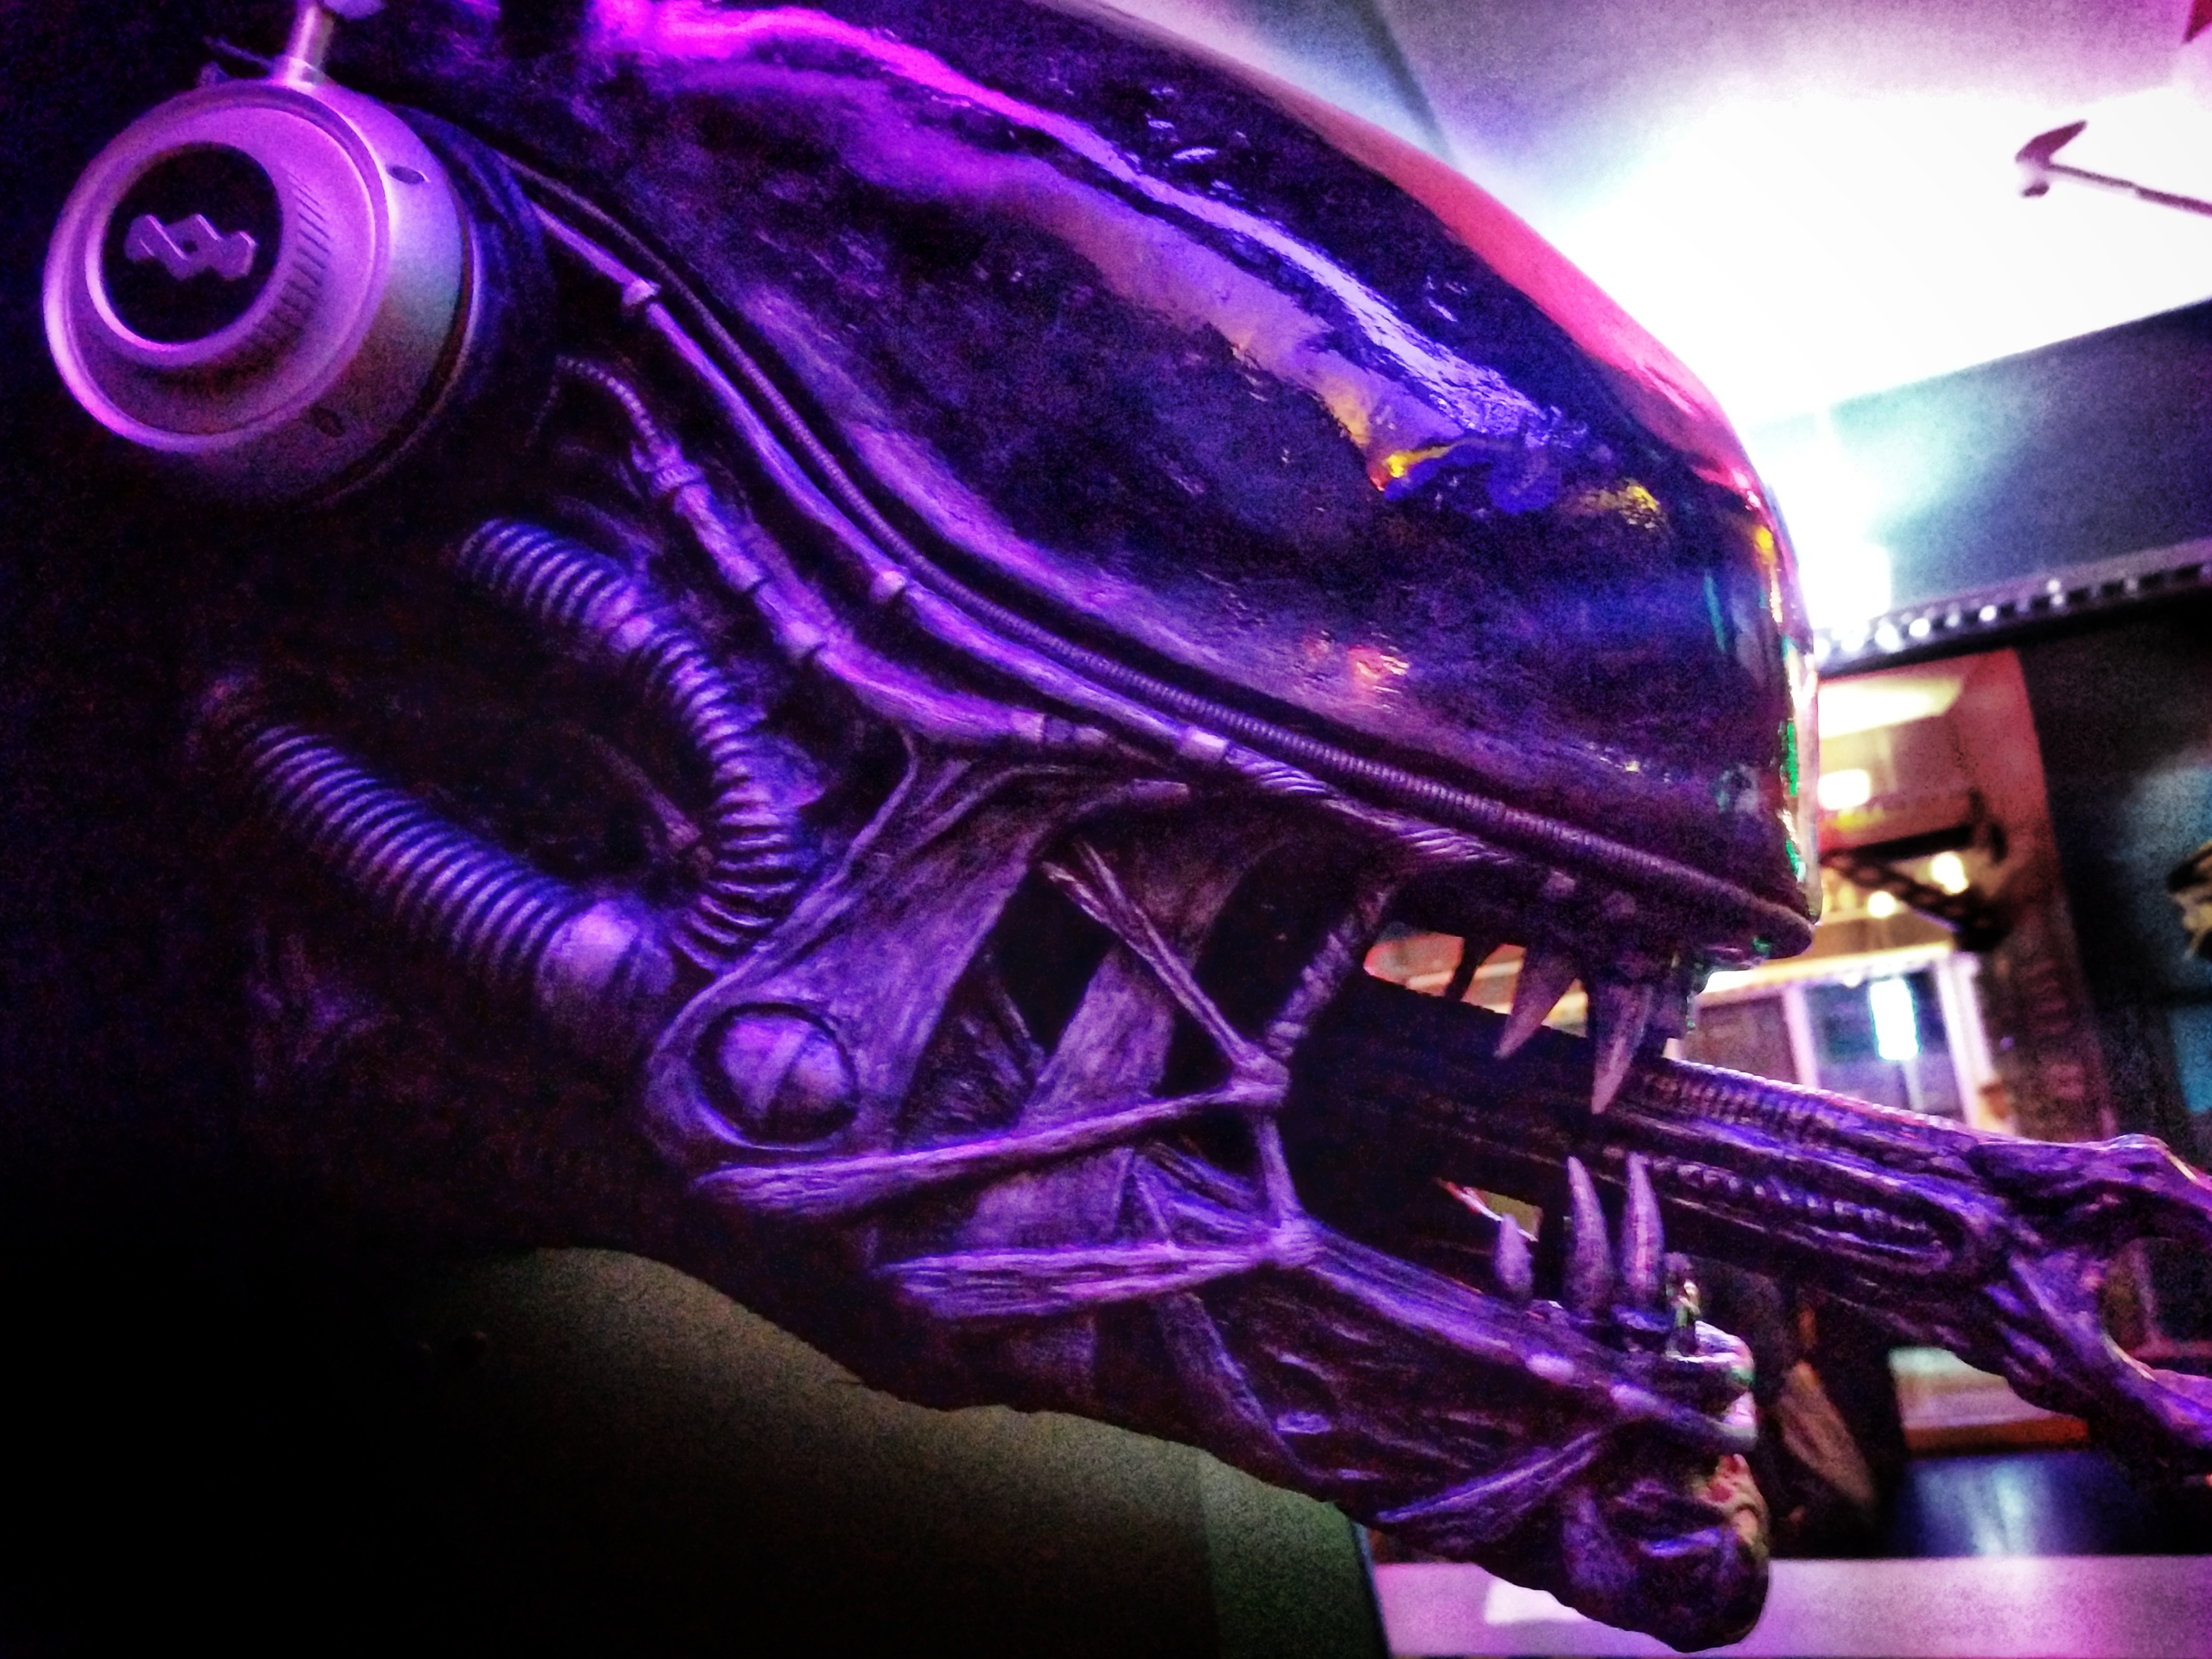 Alien head model at the defunct Photonflux bar, Wellington